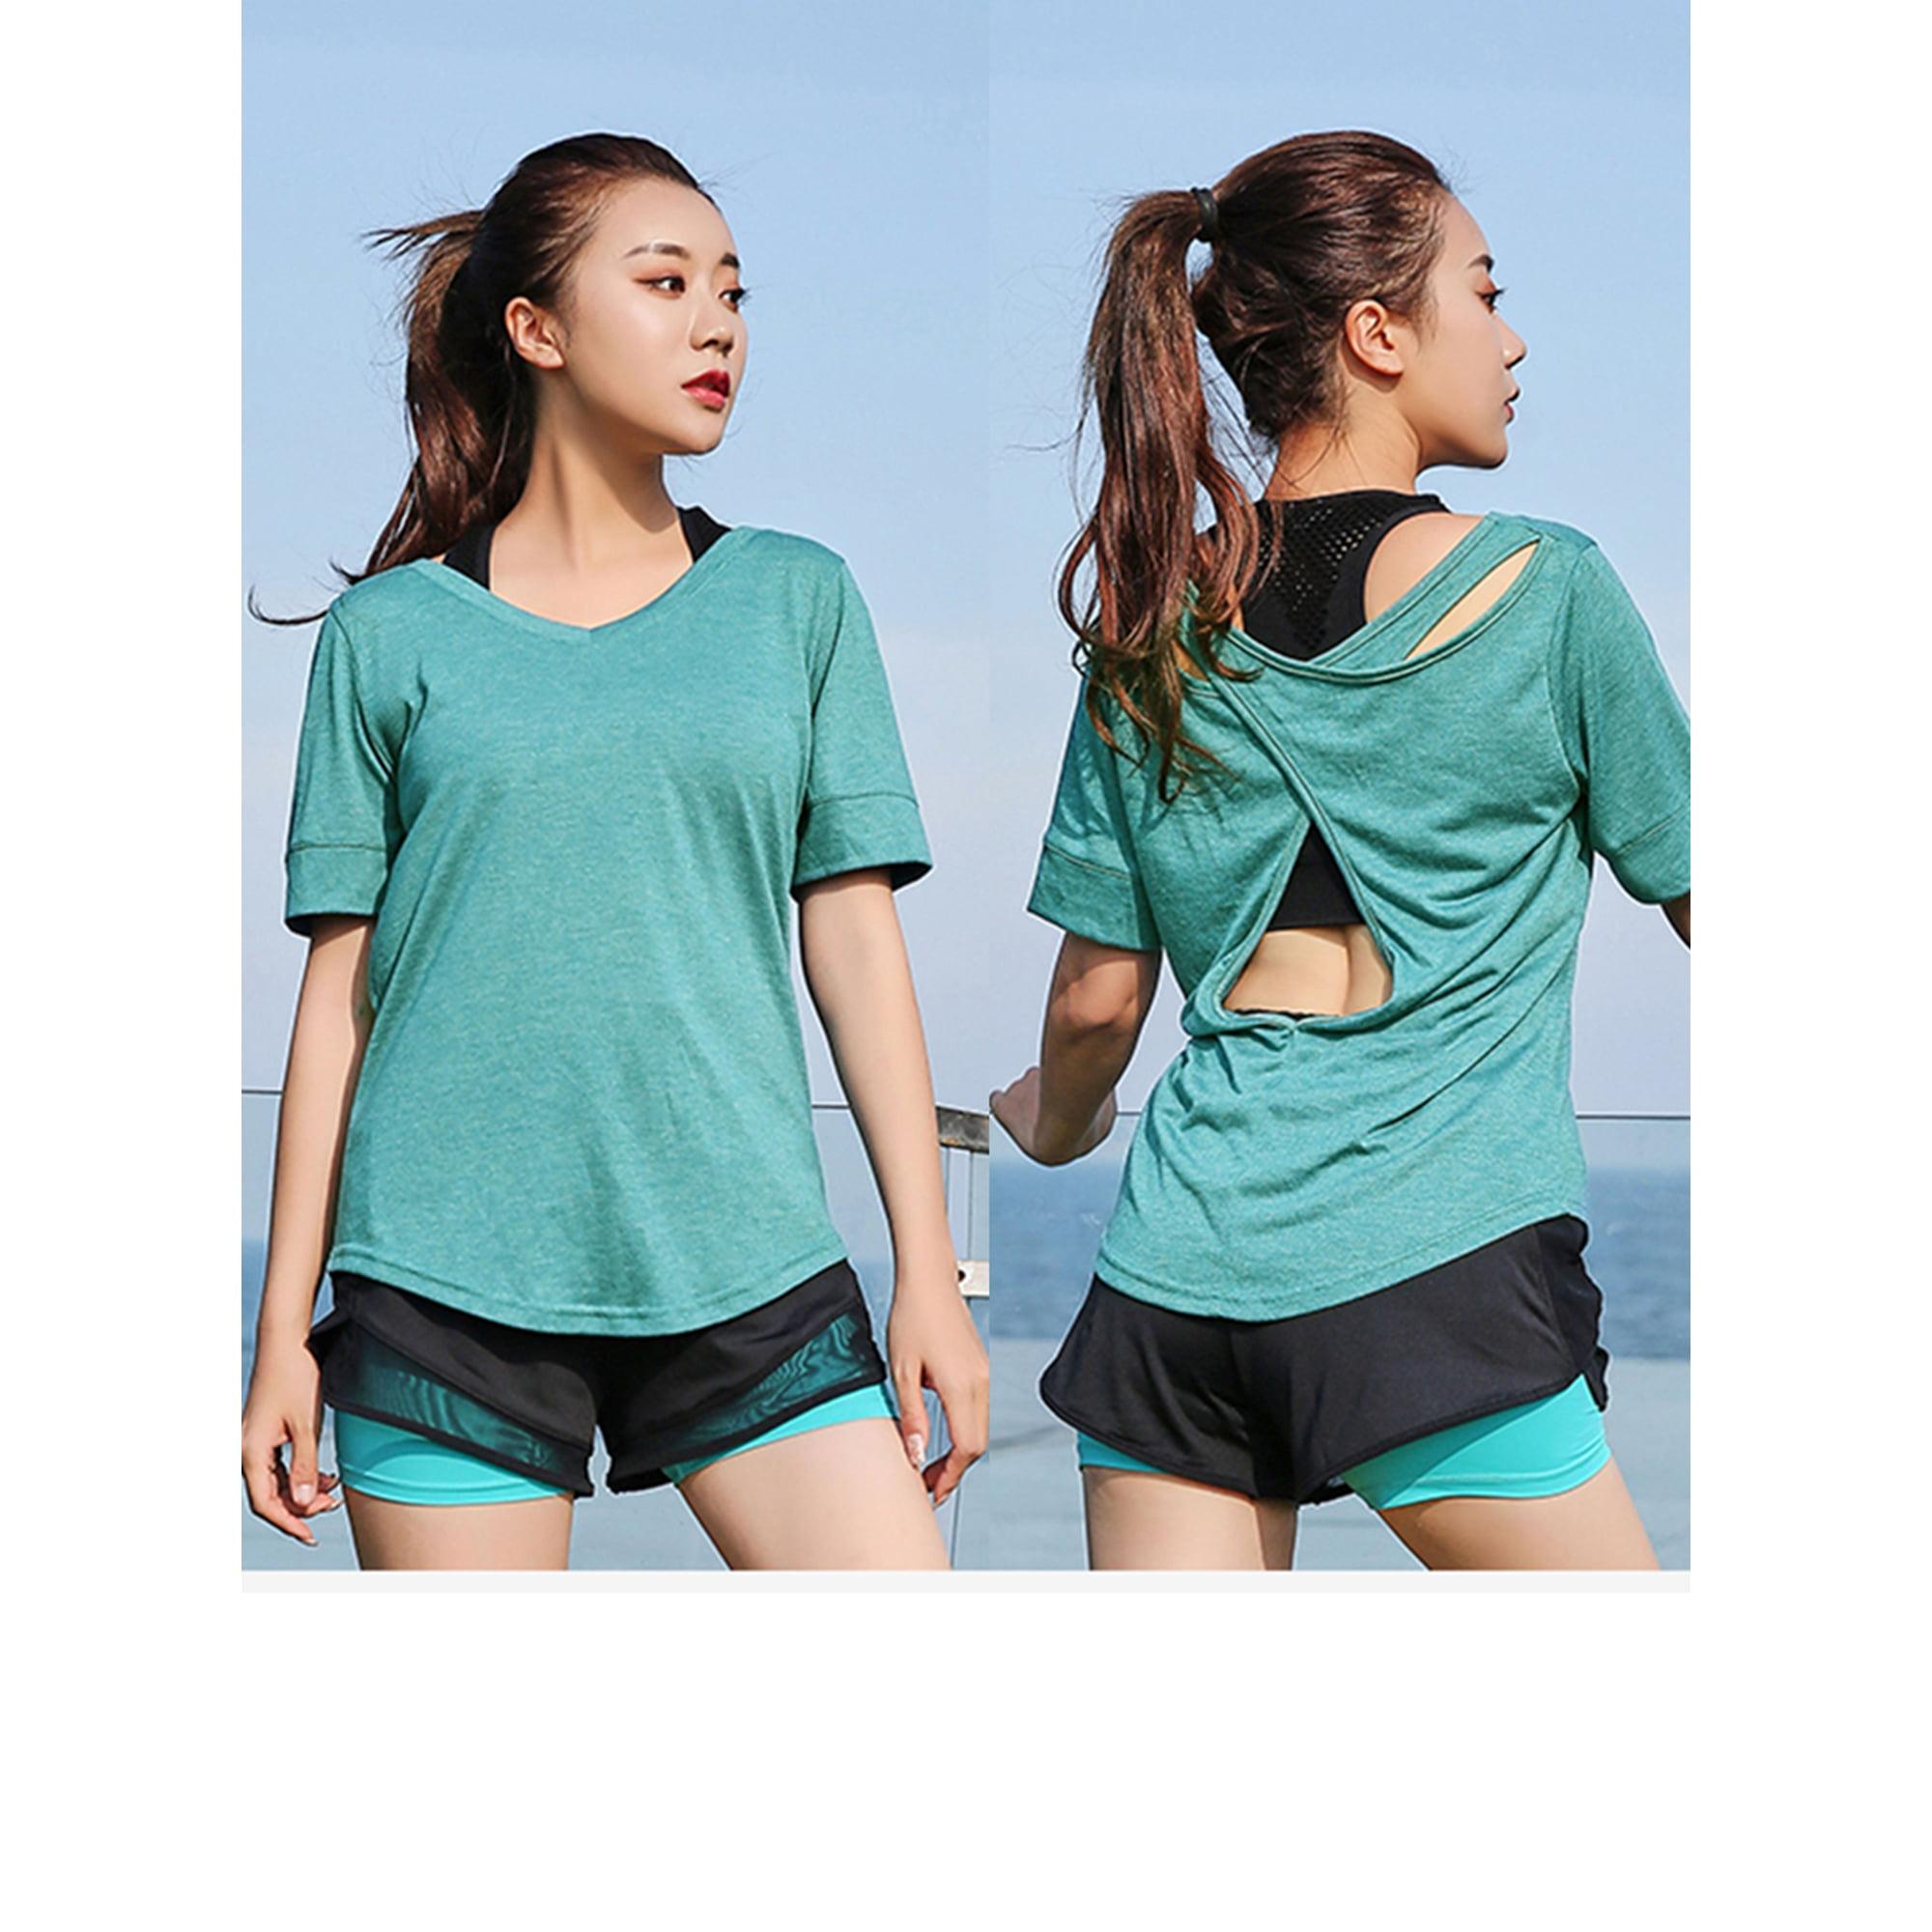 Women's Activewear Short Sleeve Yoga T-Shirt Tops Activewear Running Open  Back Sports Yoga Shirts | Walmart Canada